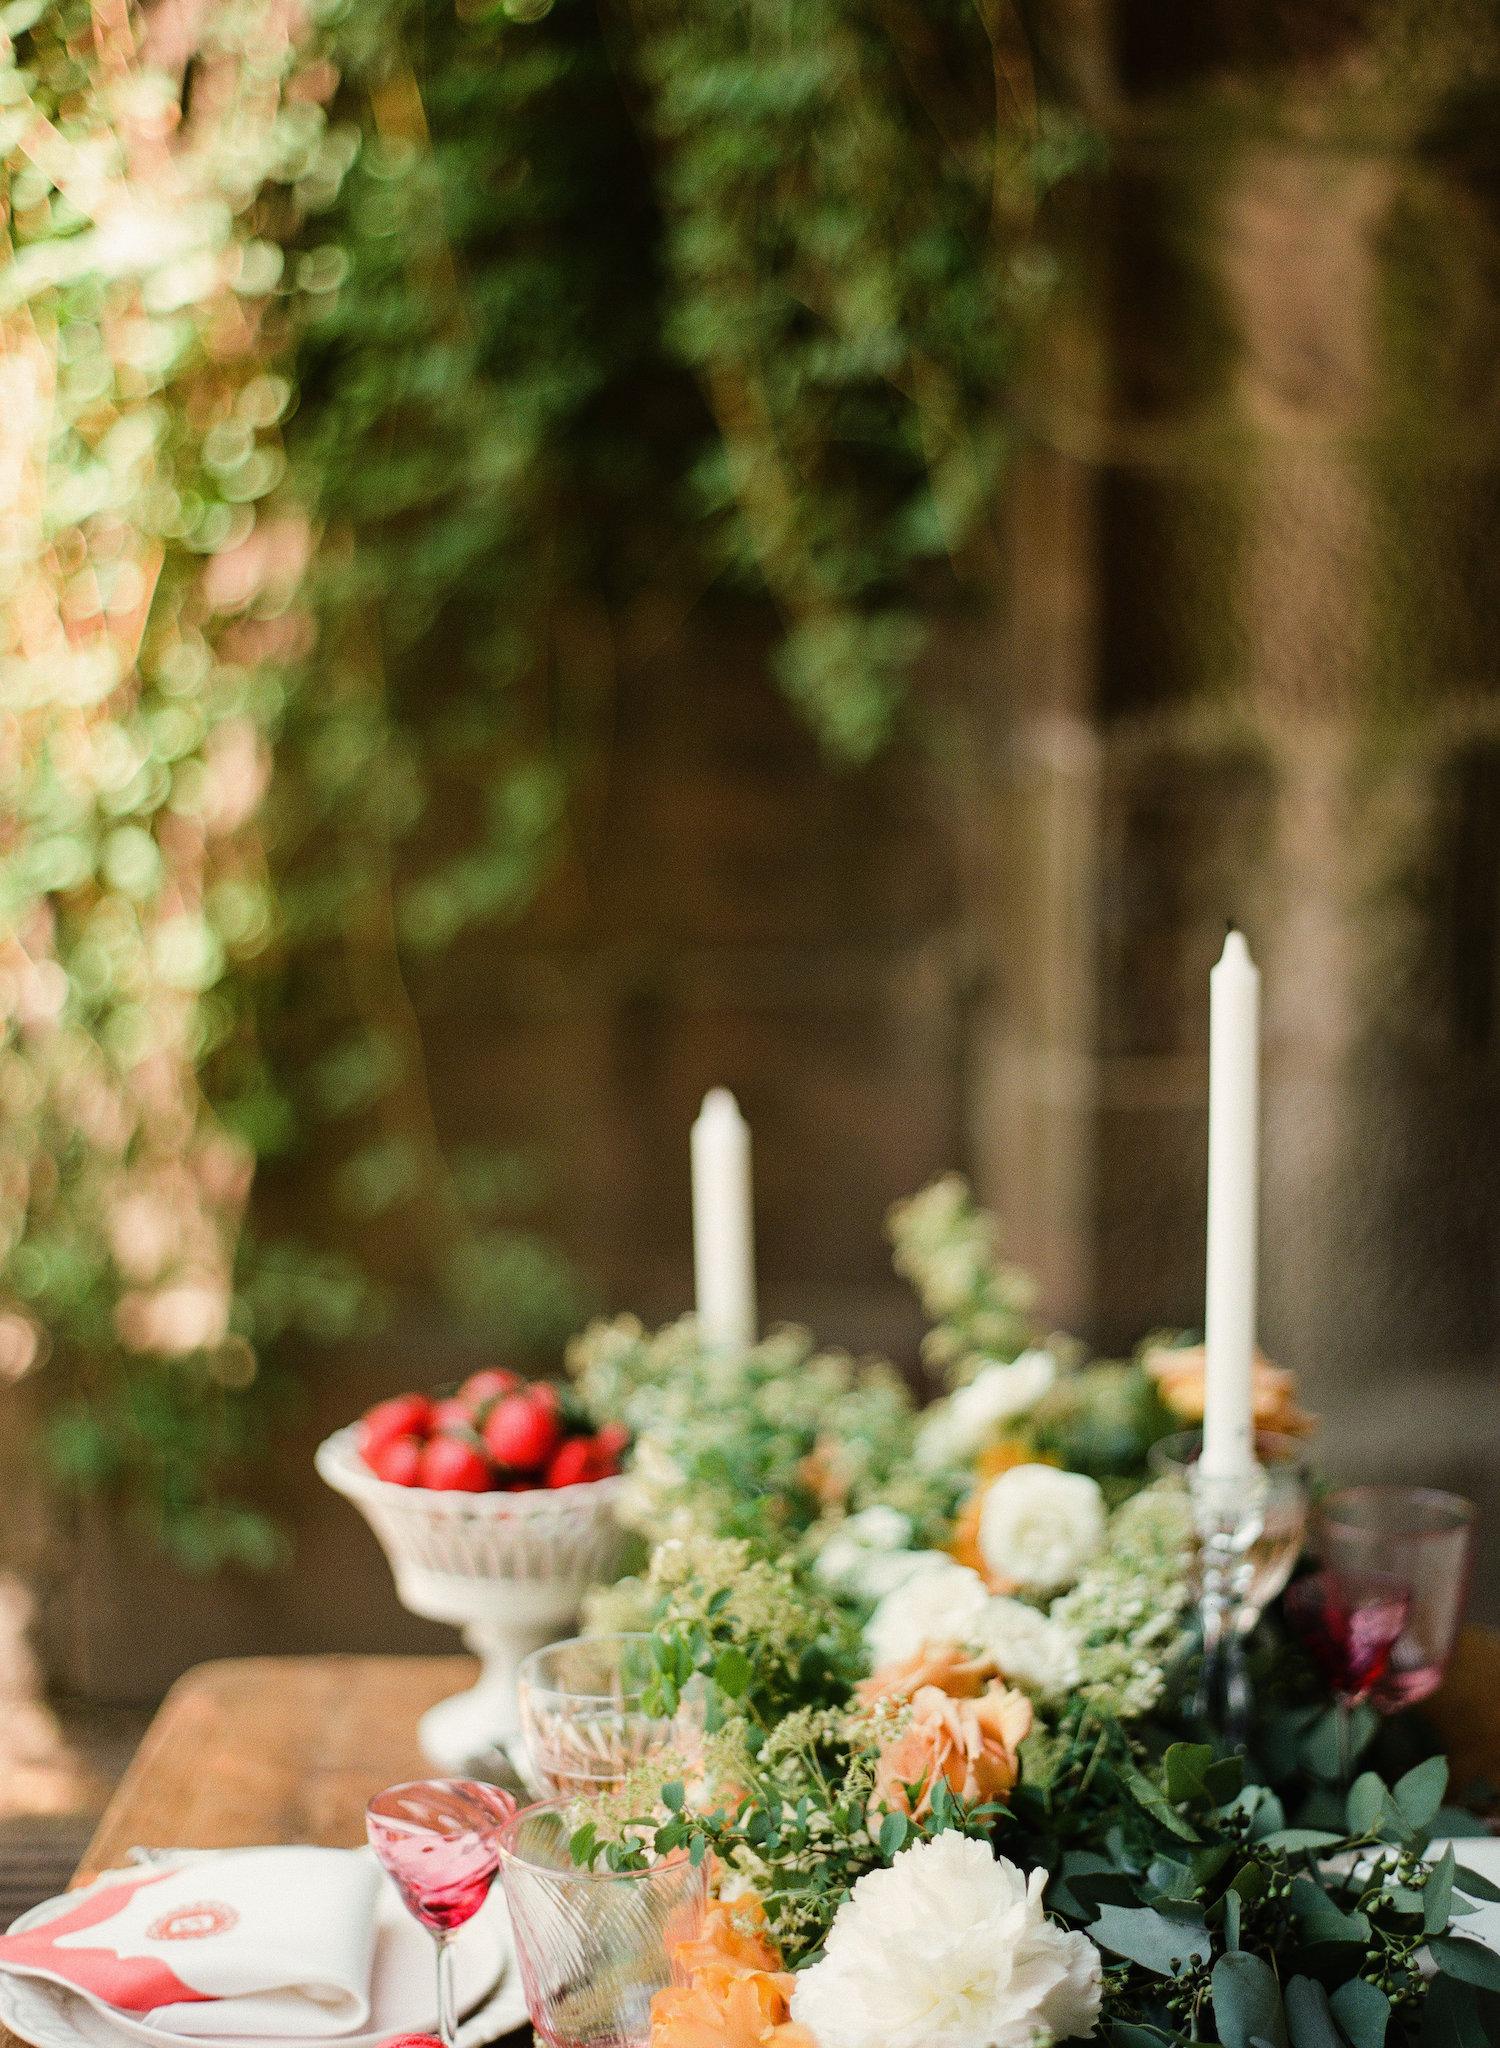 Morning Glow - Full Aperture Floral & Lindsay Madden Photography 82.jpeg